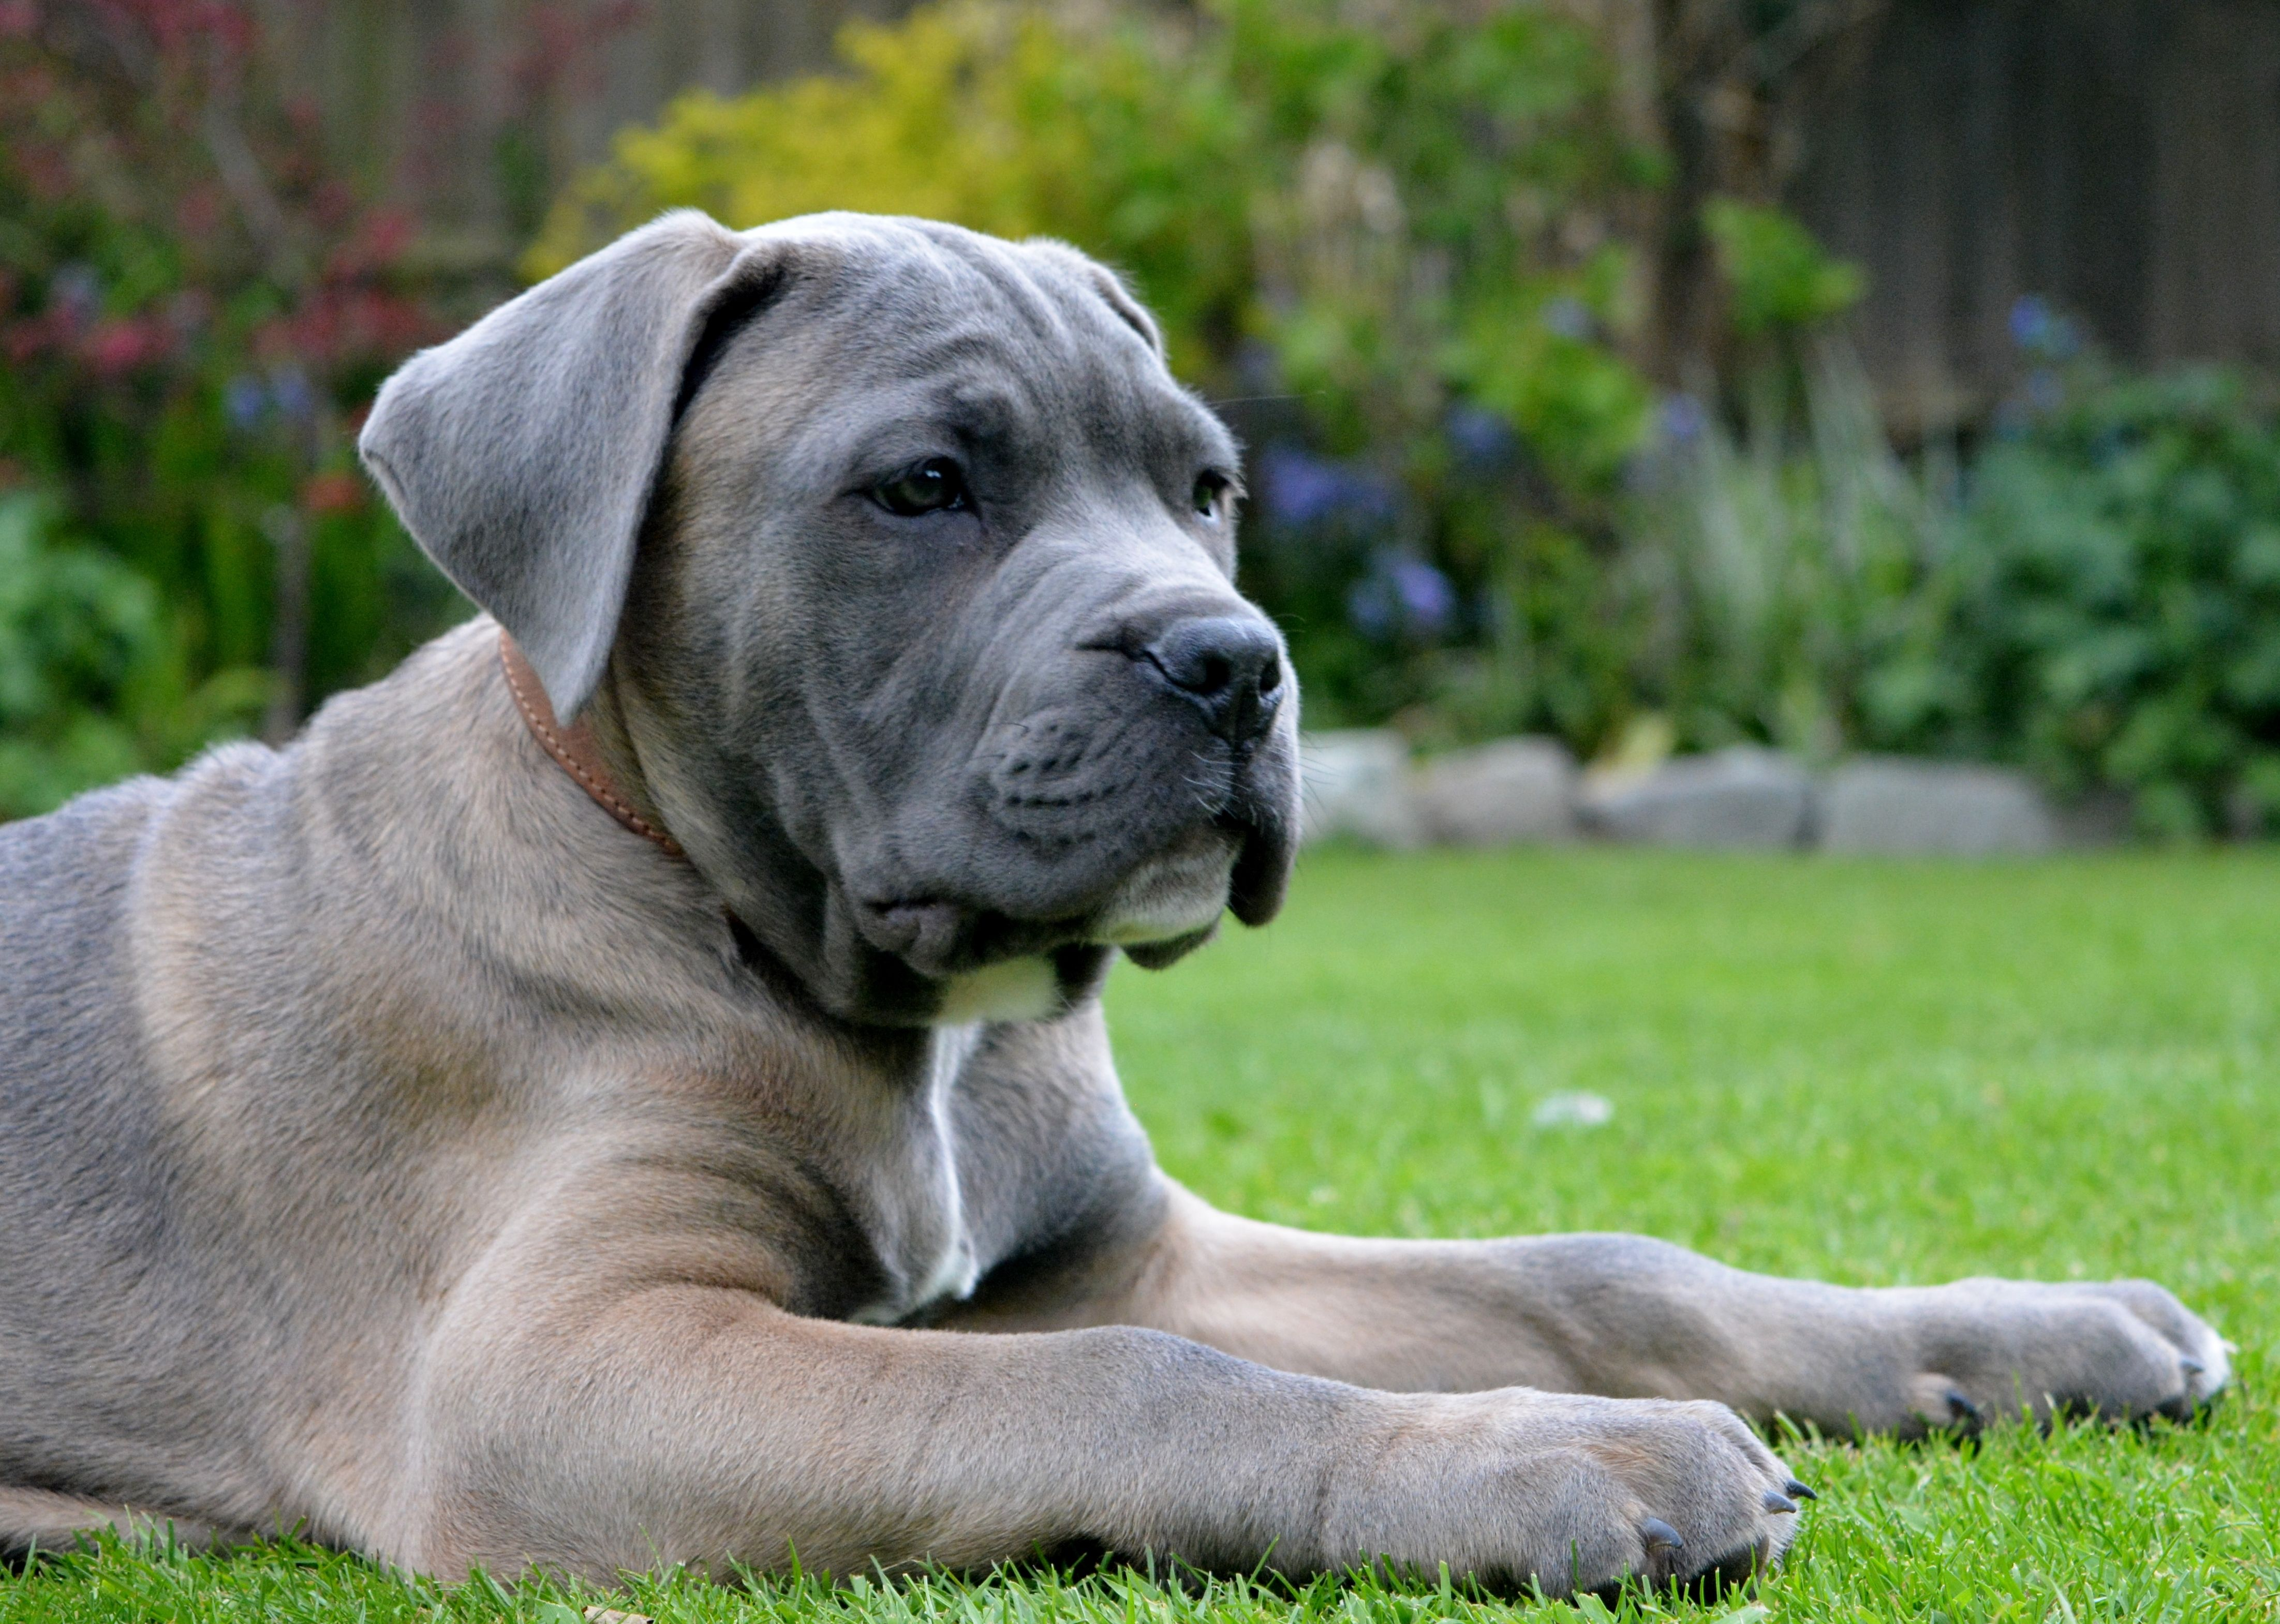 Formentino Cane Corso Pup Danny Cane Corso Best Dog Breeds Cane Corso Puppies